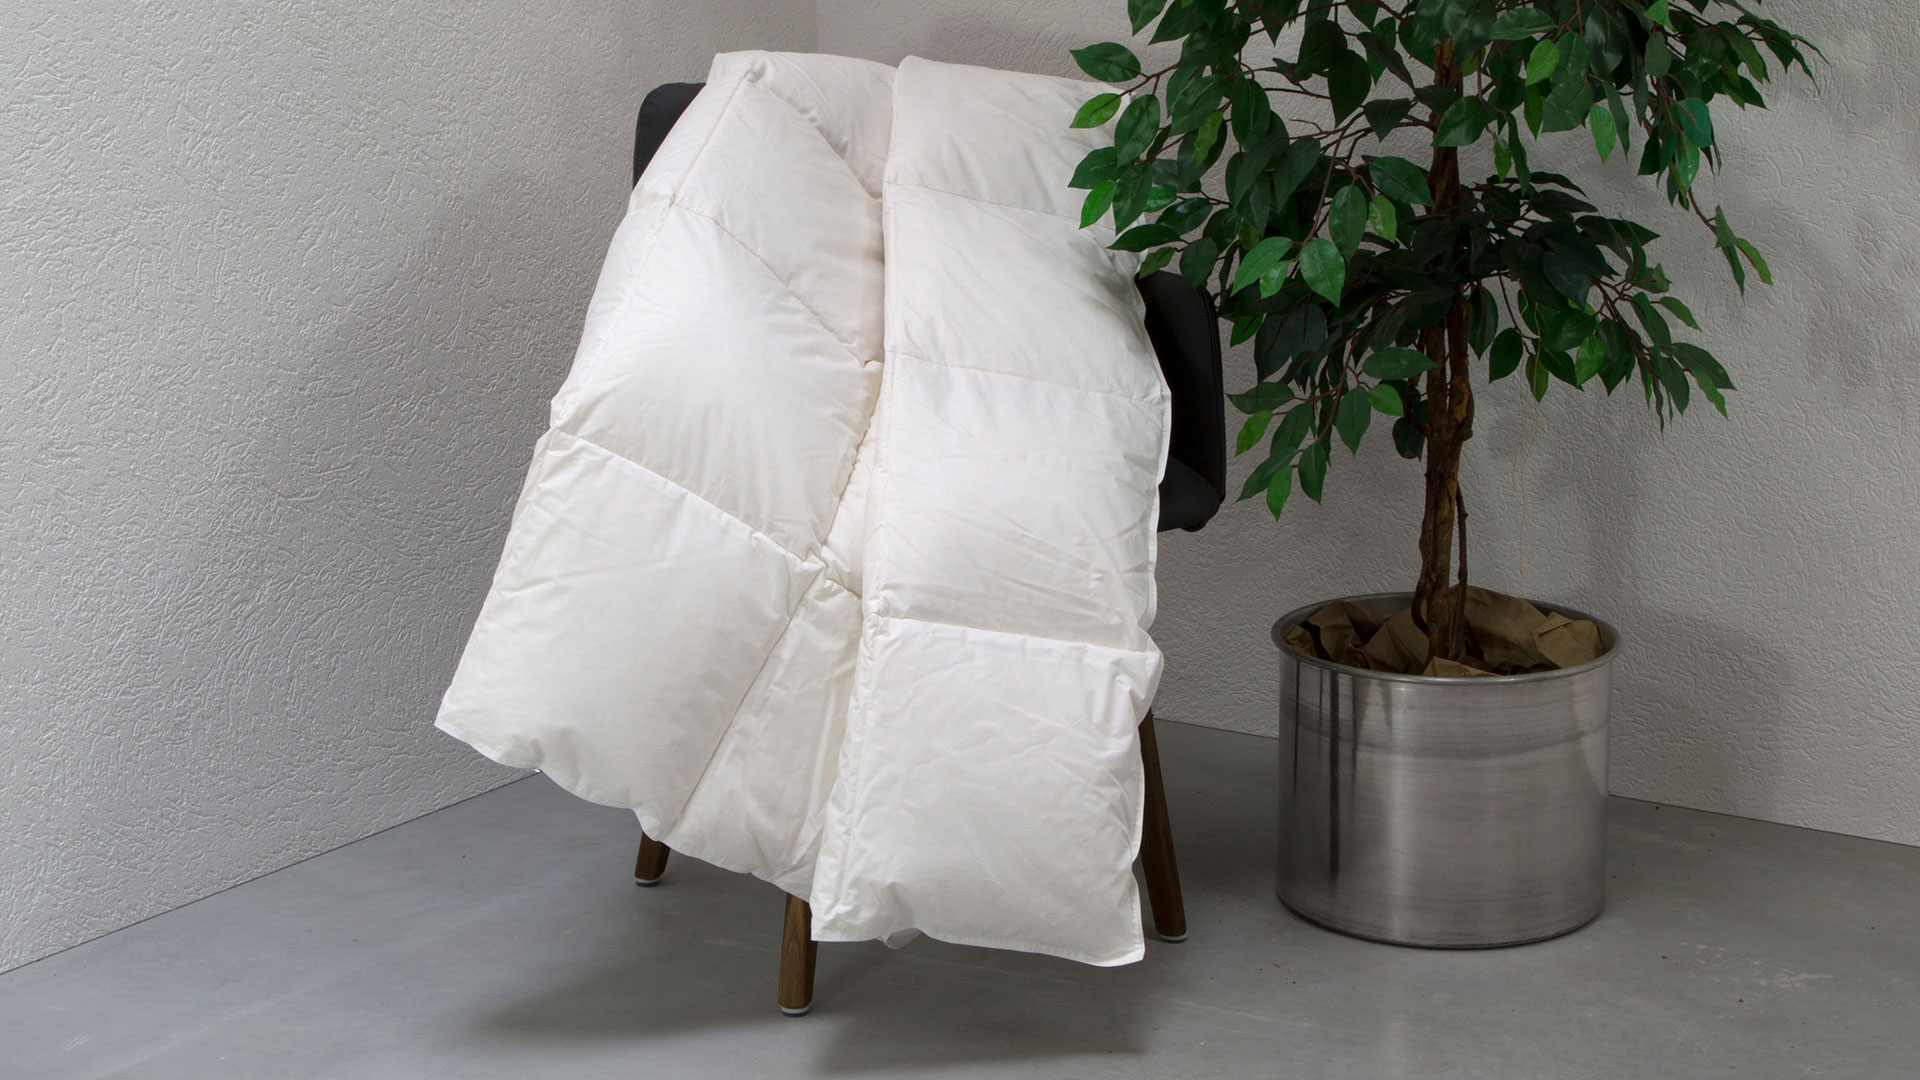 daunen leicht bettdecke ansara superior. Black Bedroom Furniture Sets. Home Design Ideas